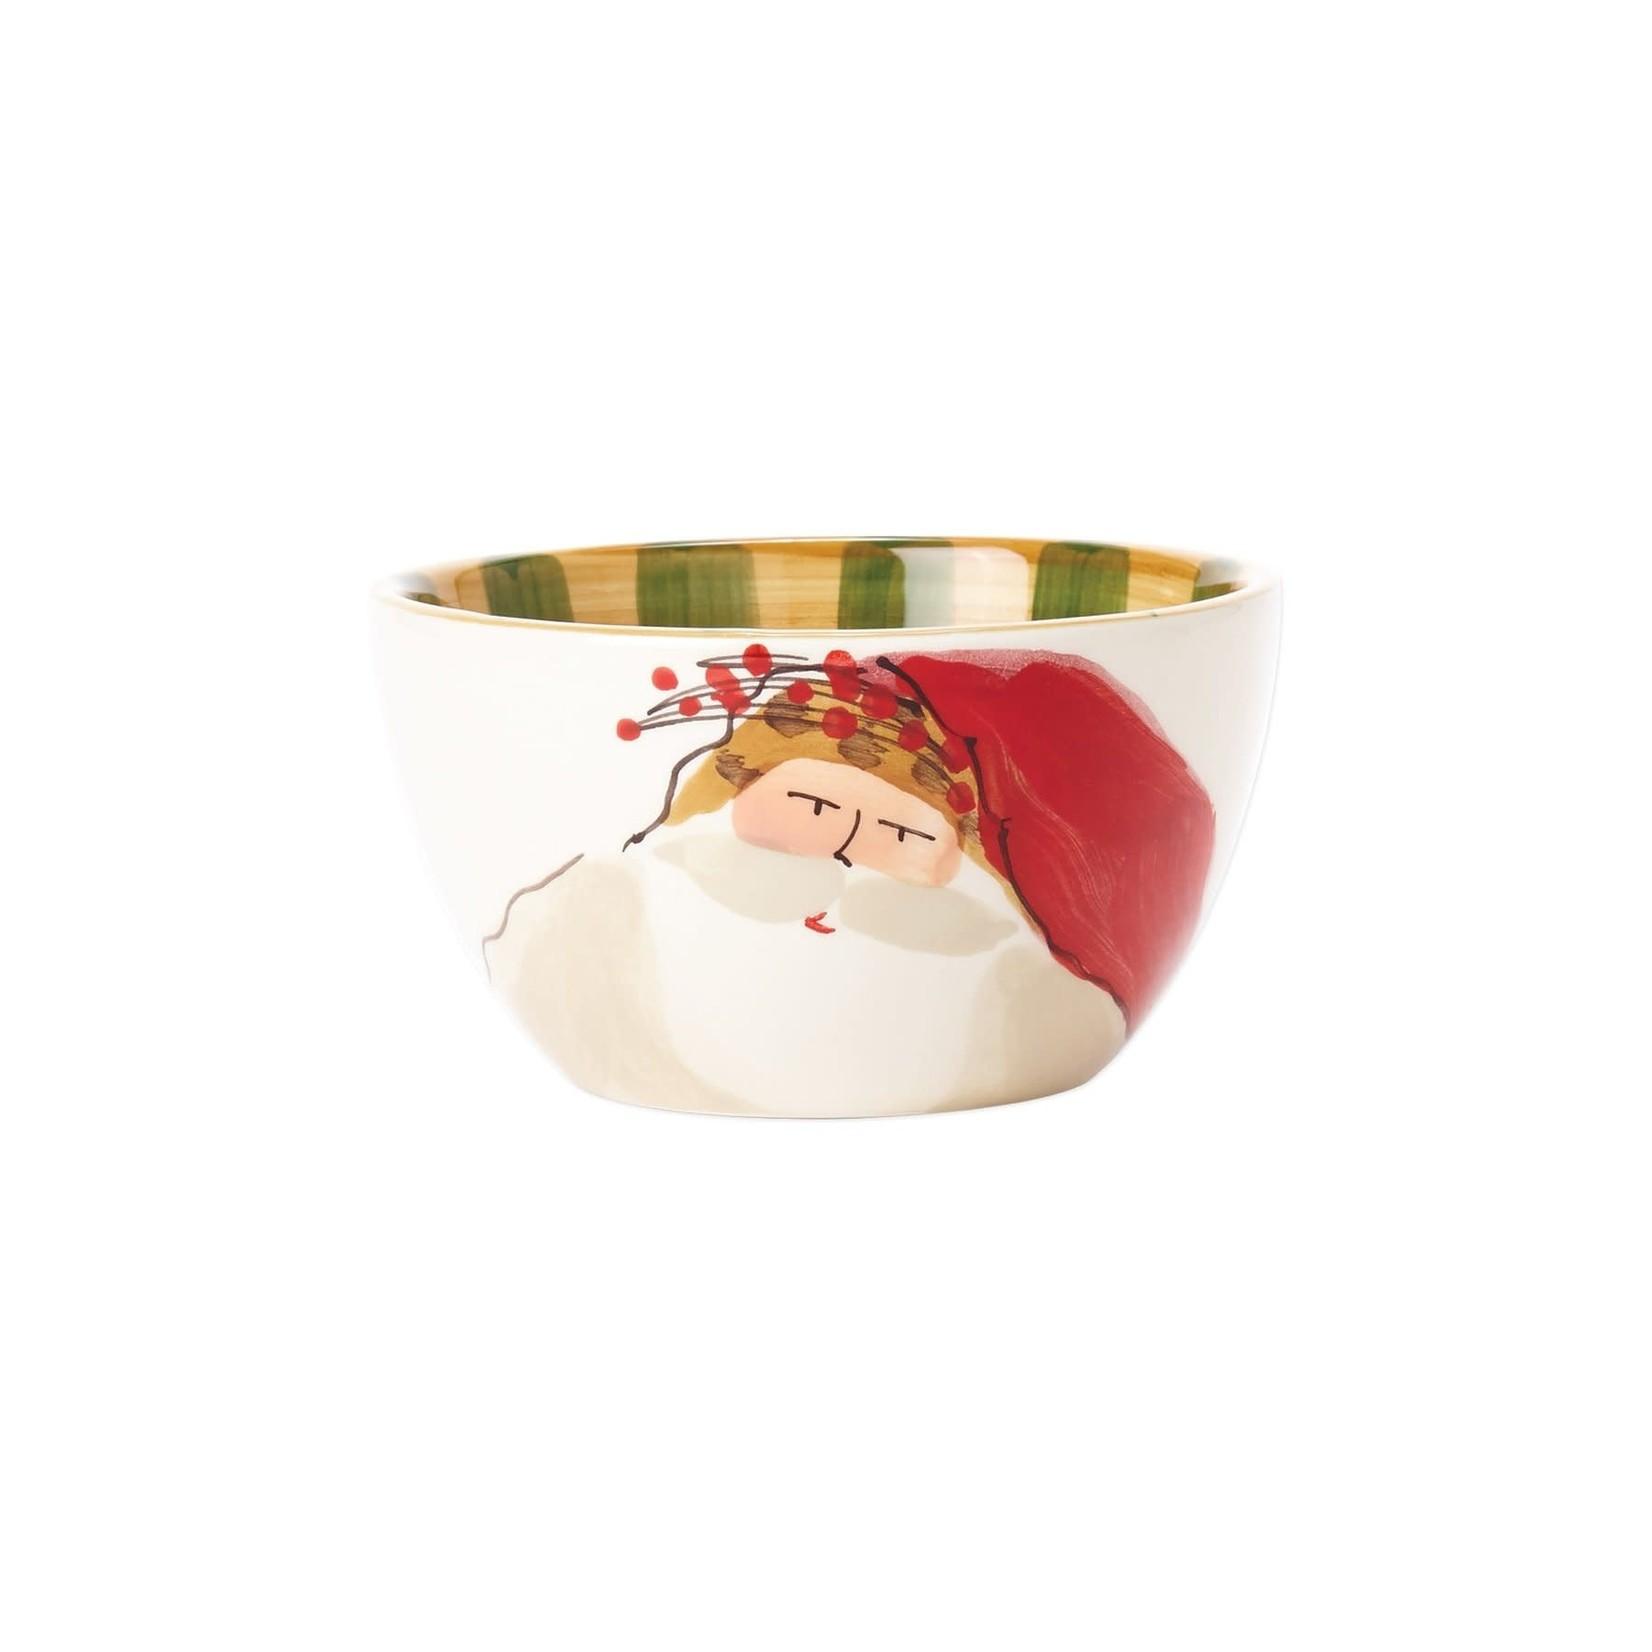 OSN Cereal Bowl Animal